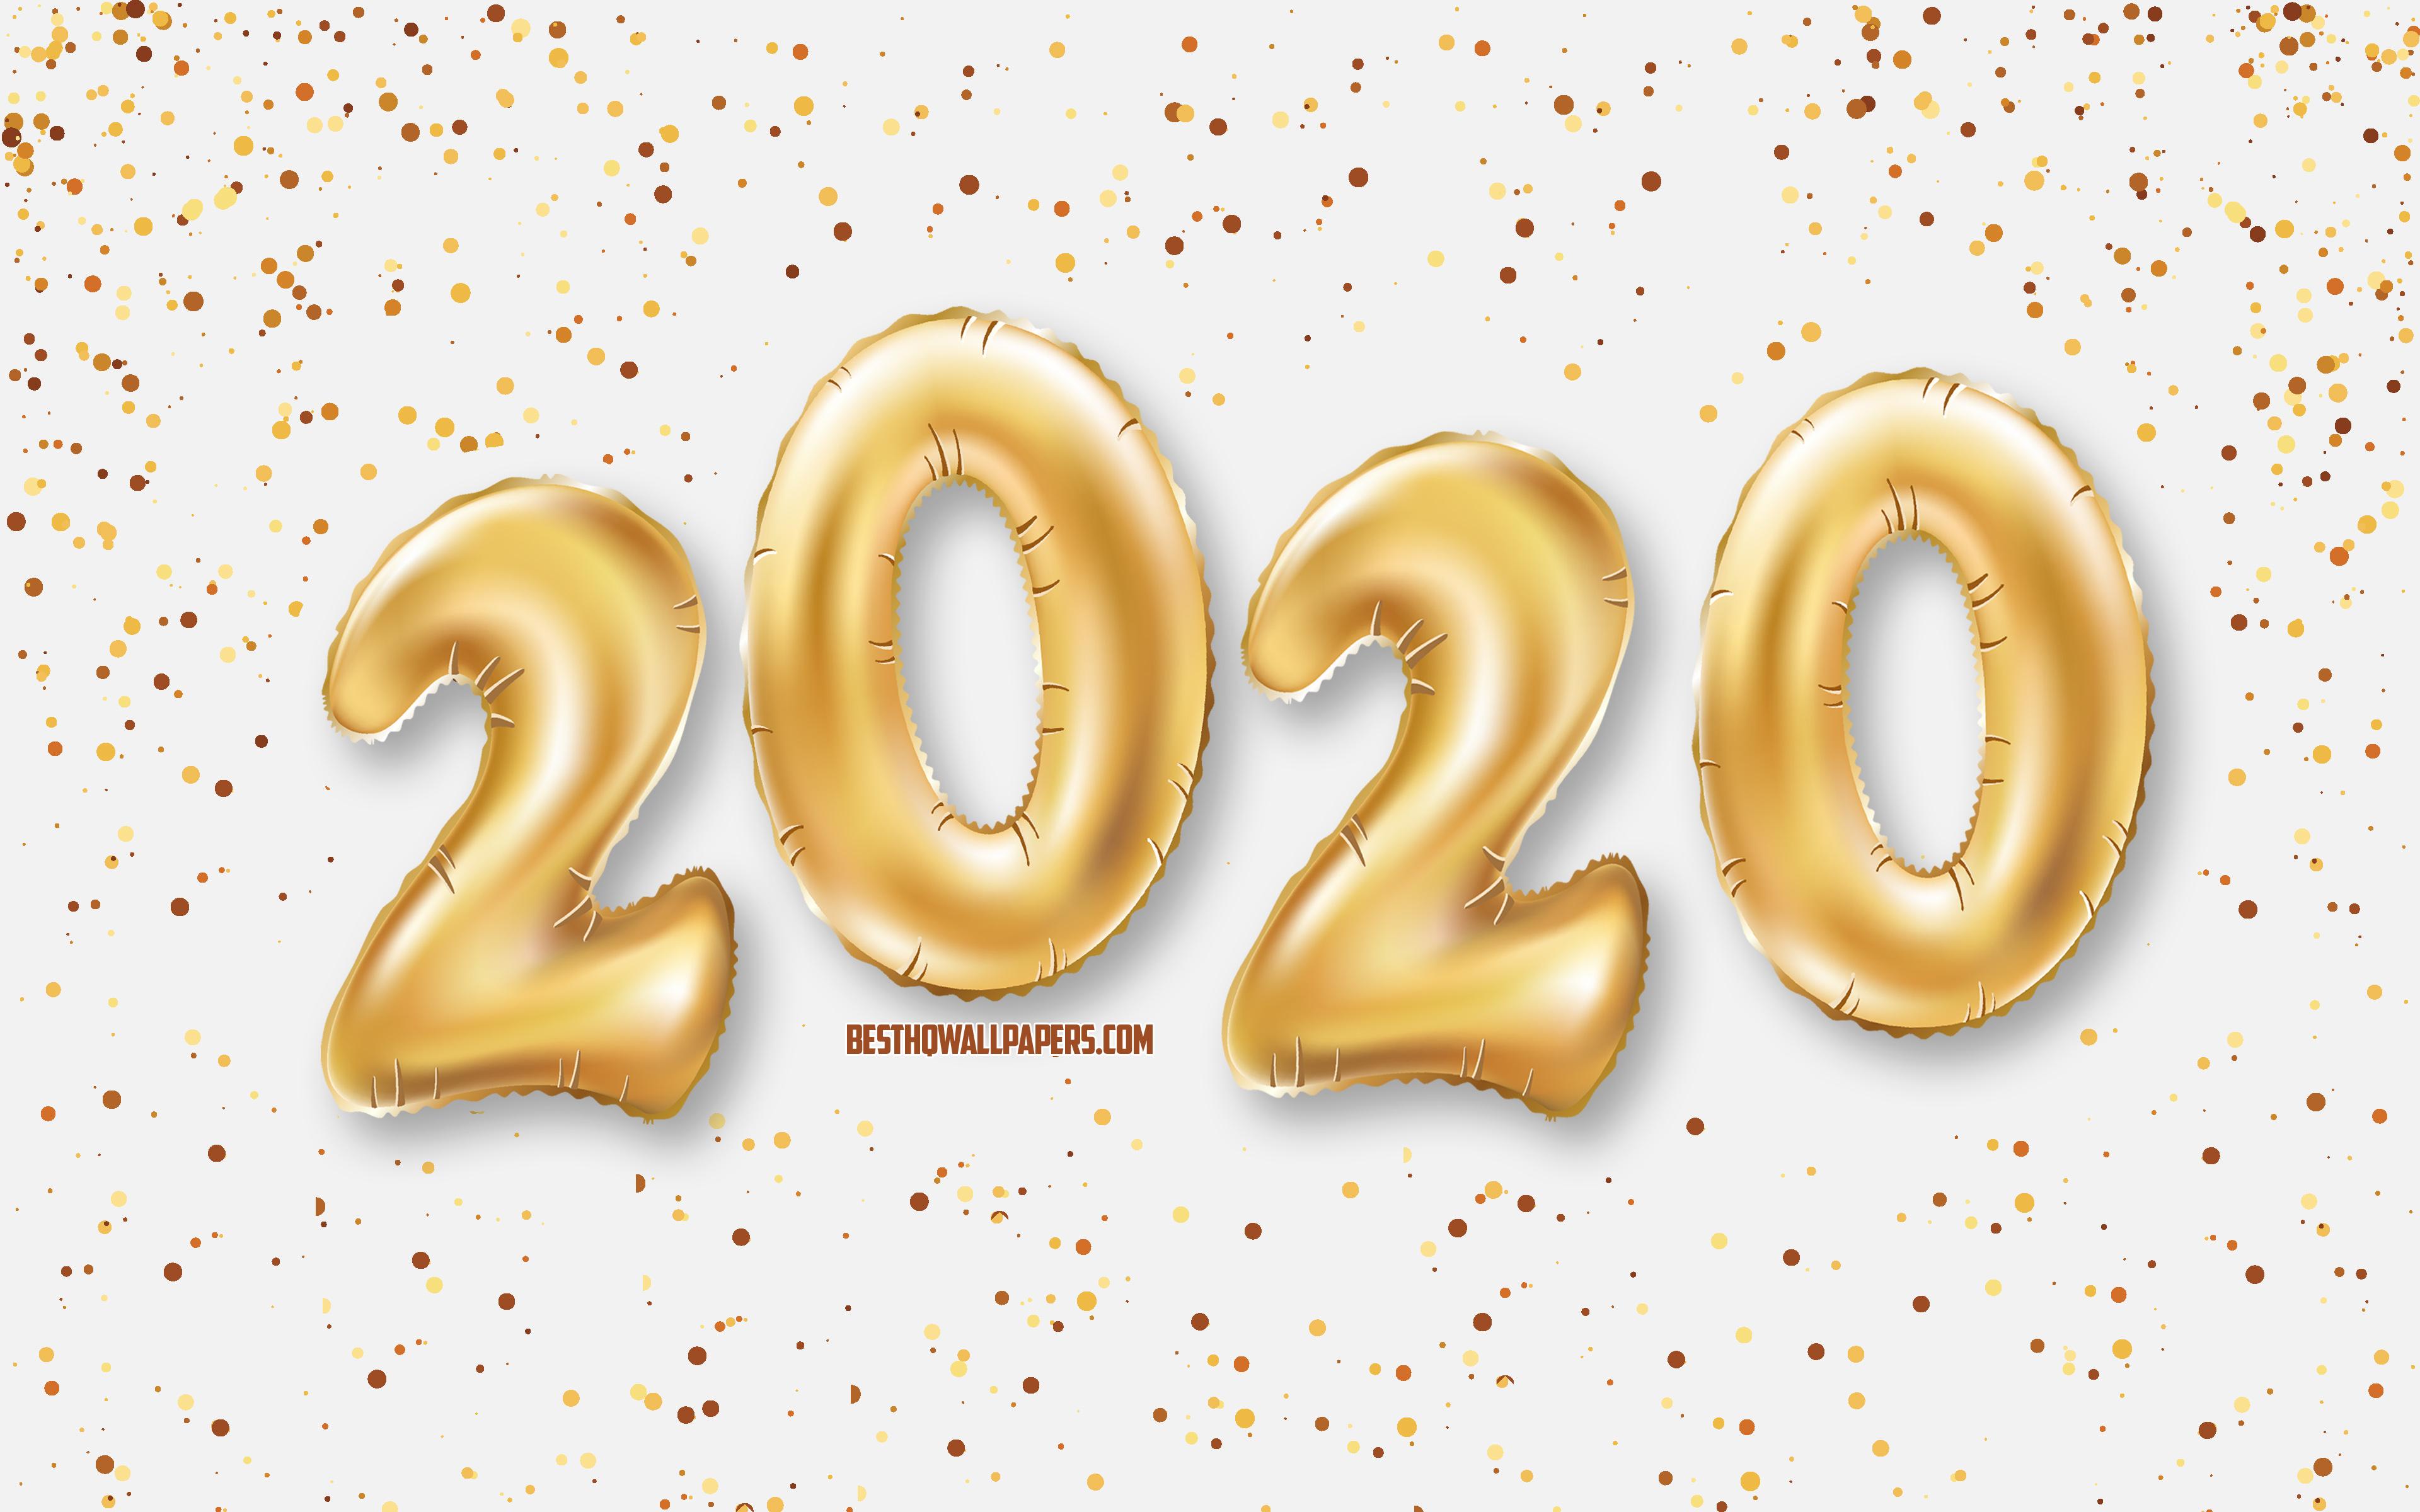 Обои На Рабочий Стол 2020г